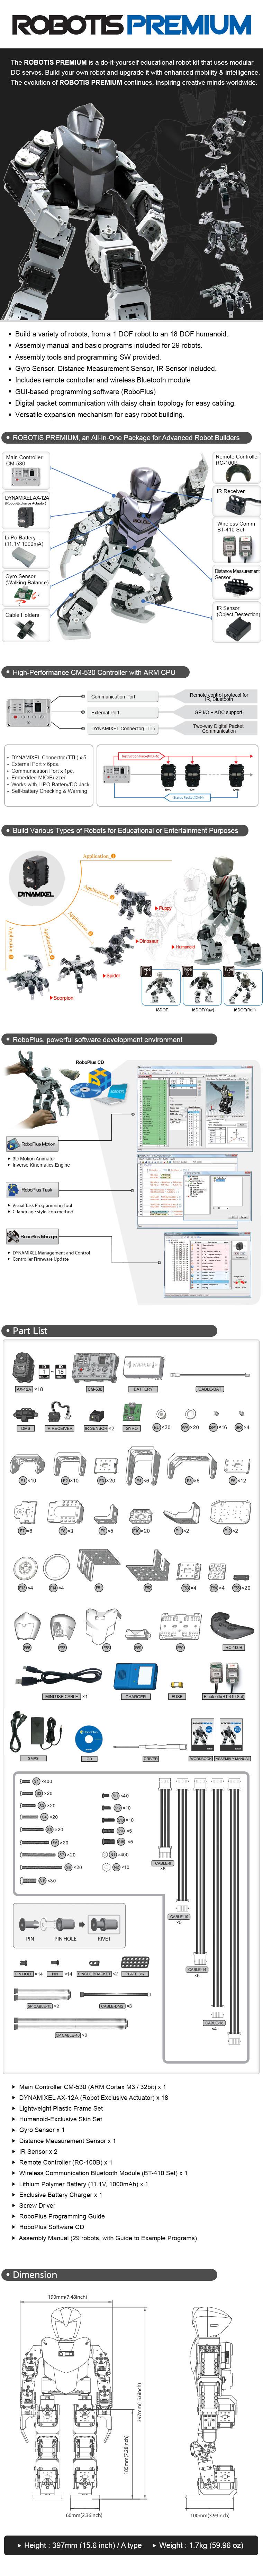 ROBOTIS_PREMIUM_EN_info_ver1642.jpg